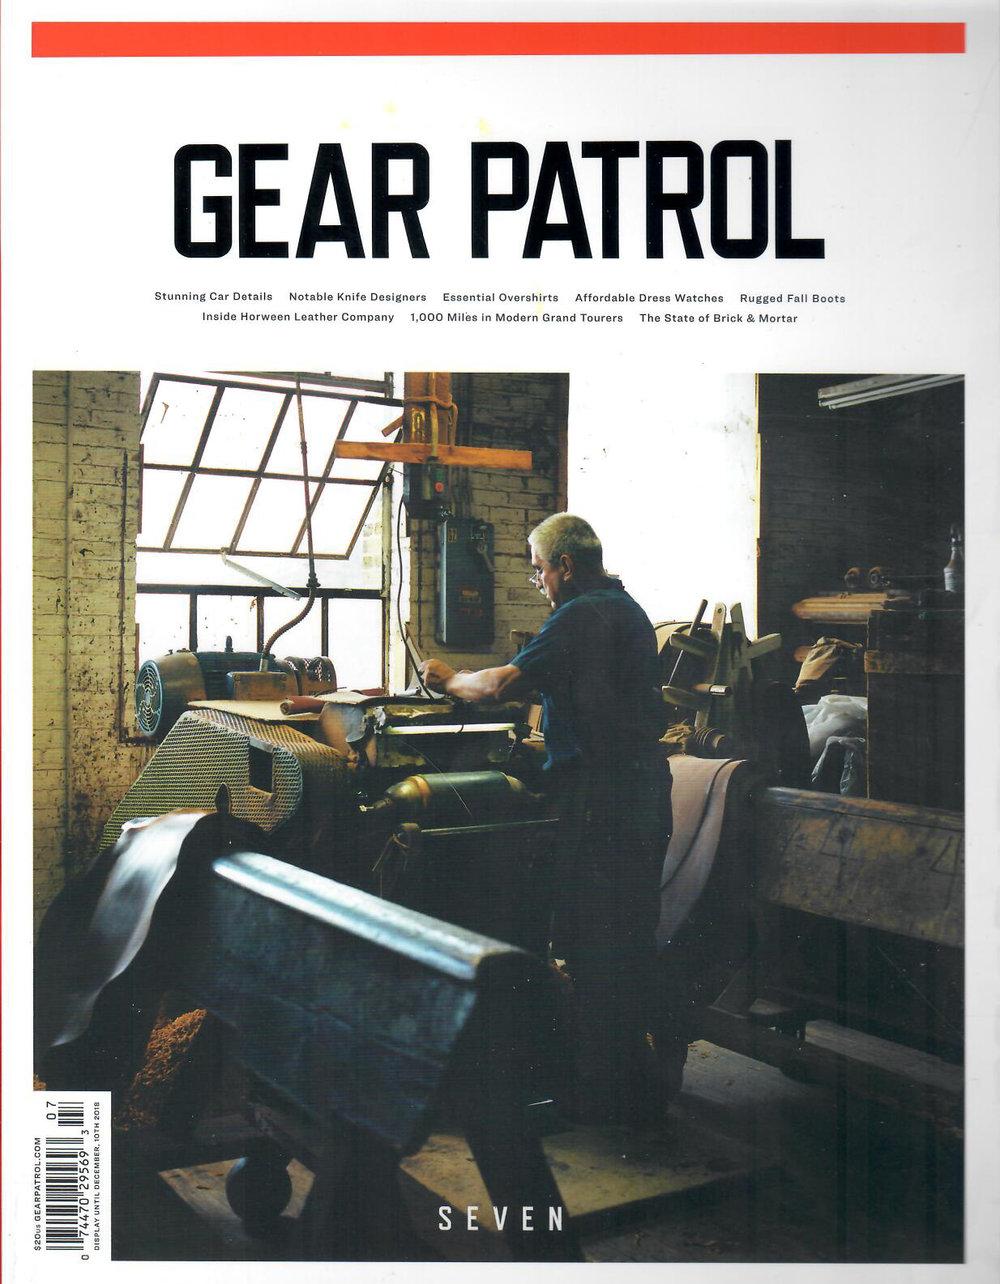 Gear_Patrol_cover.jpg